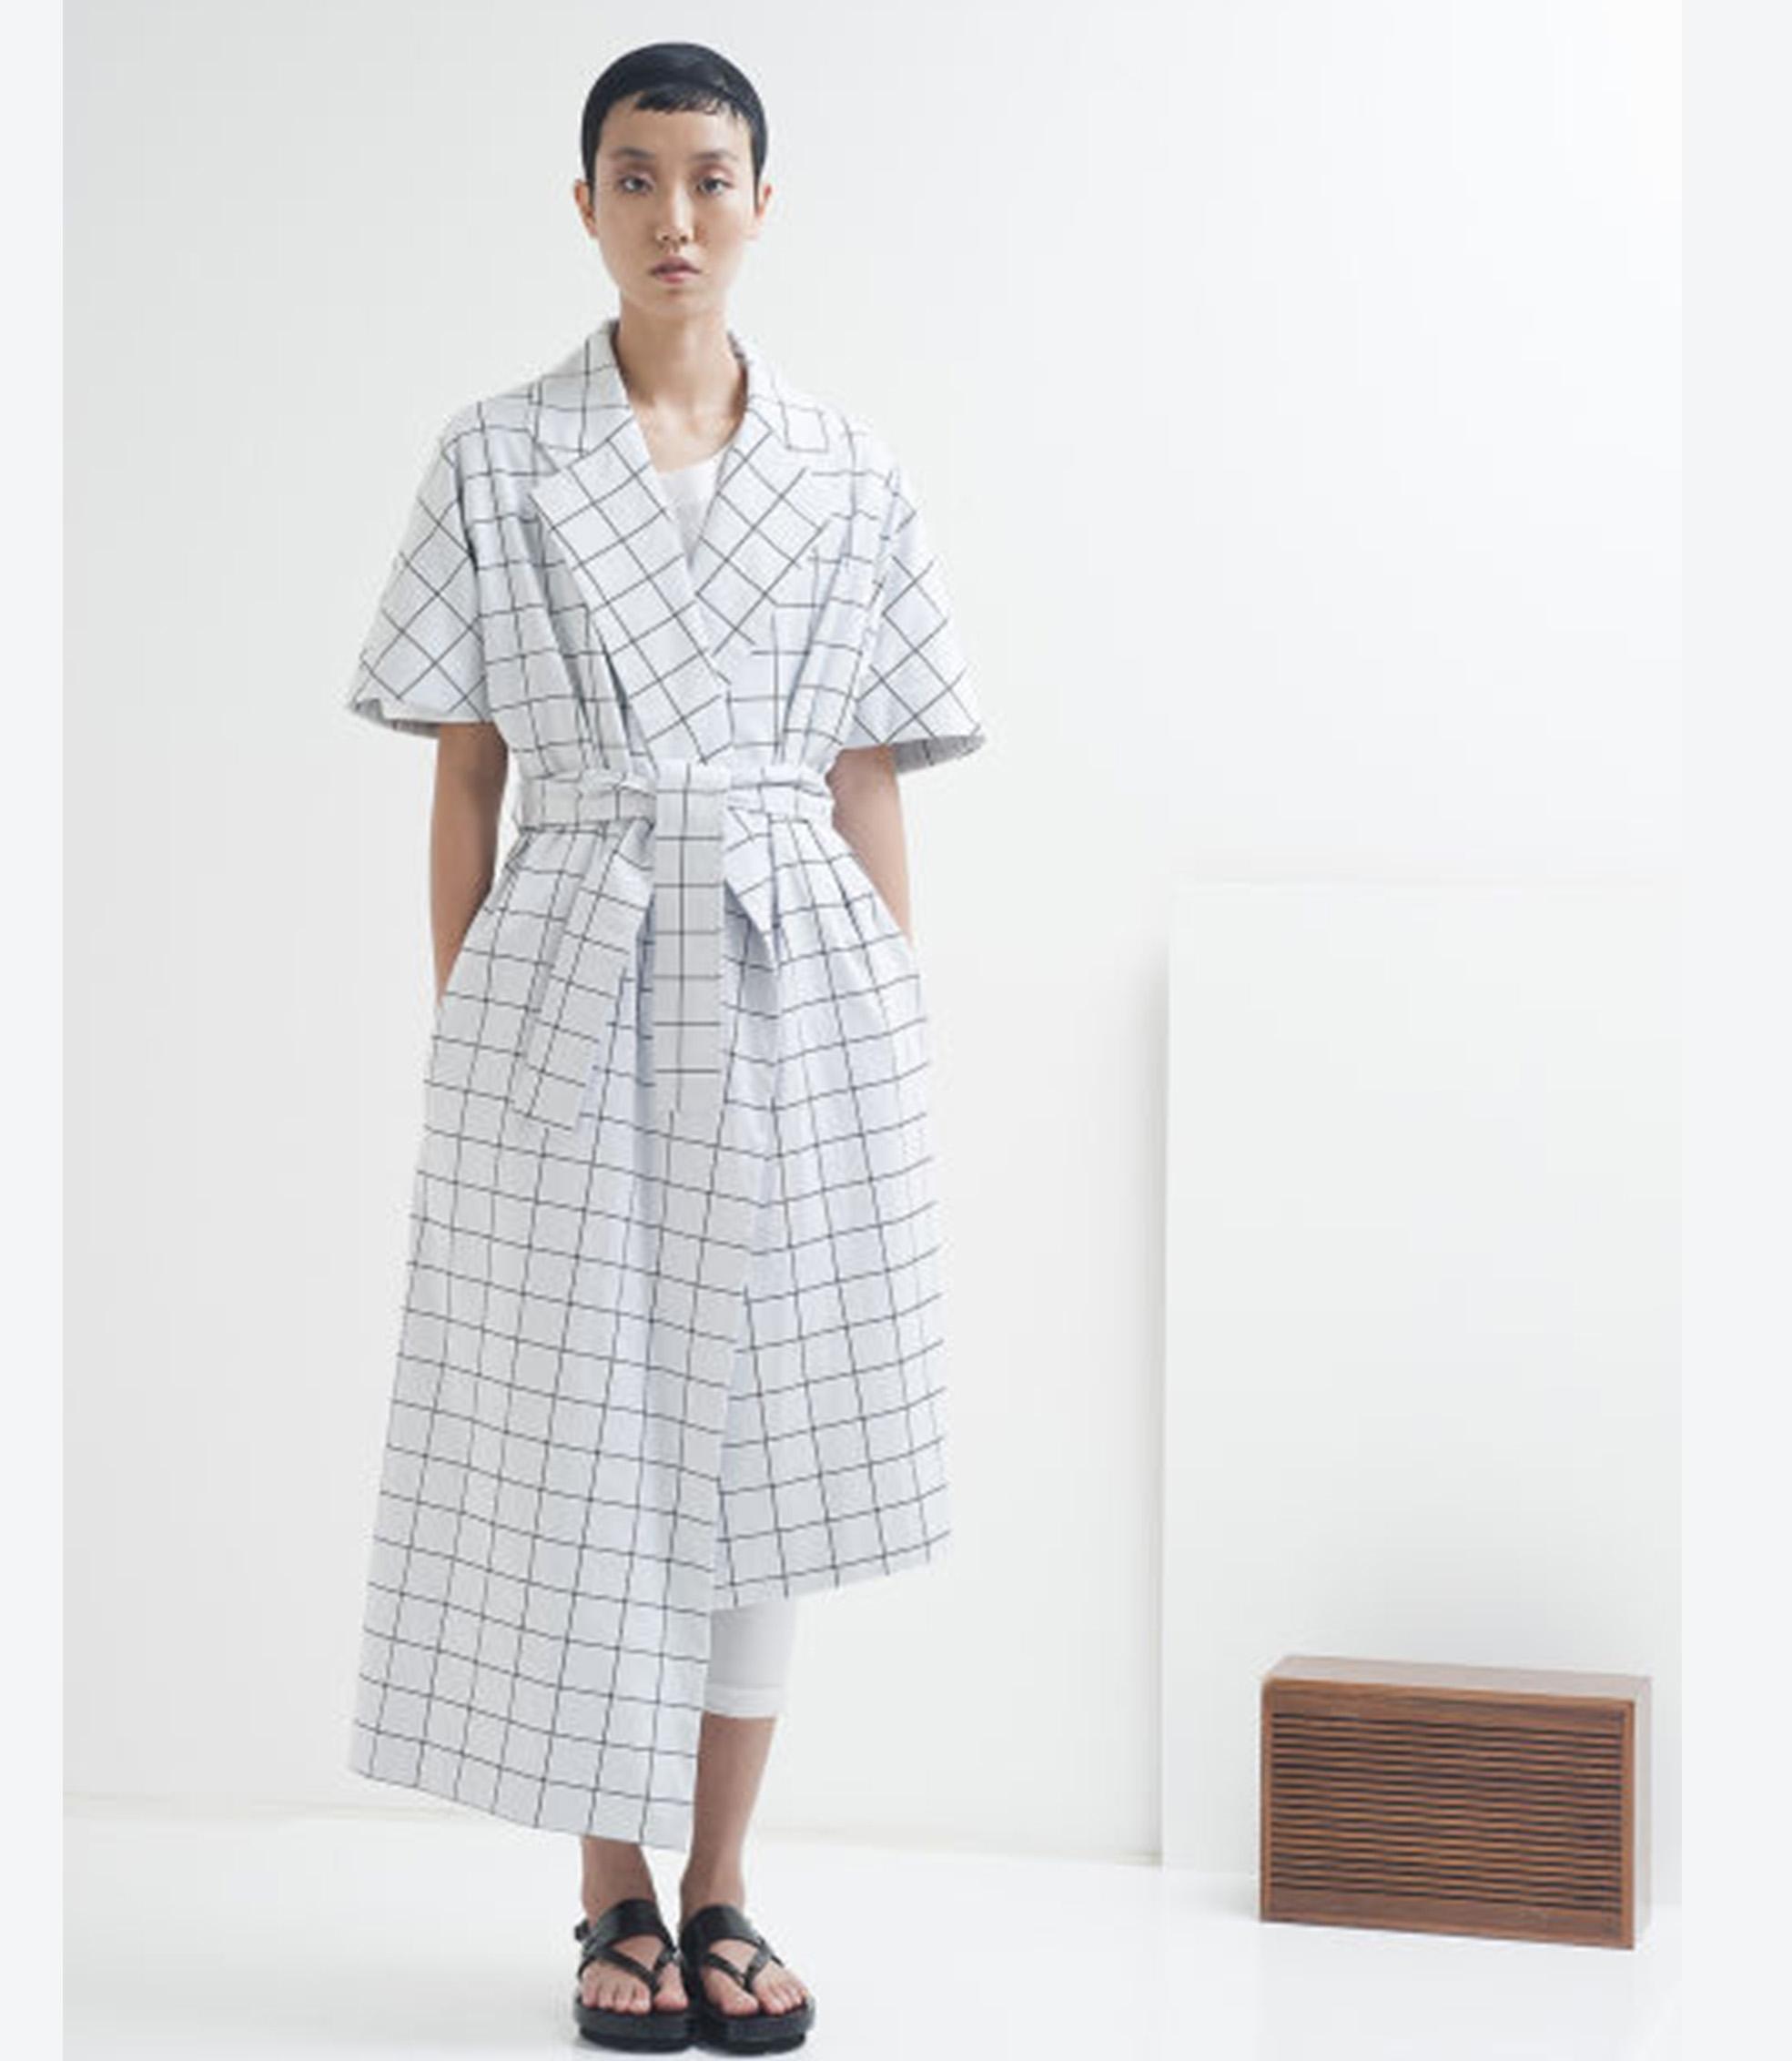 Moda coolculture for Fashion snobber